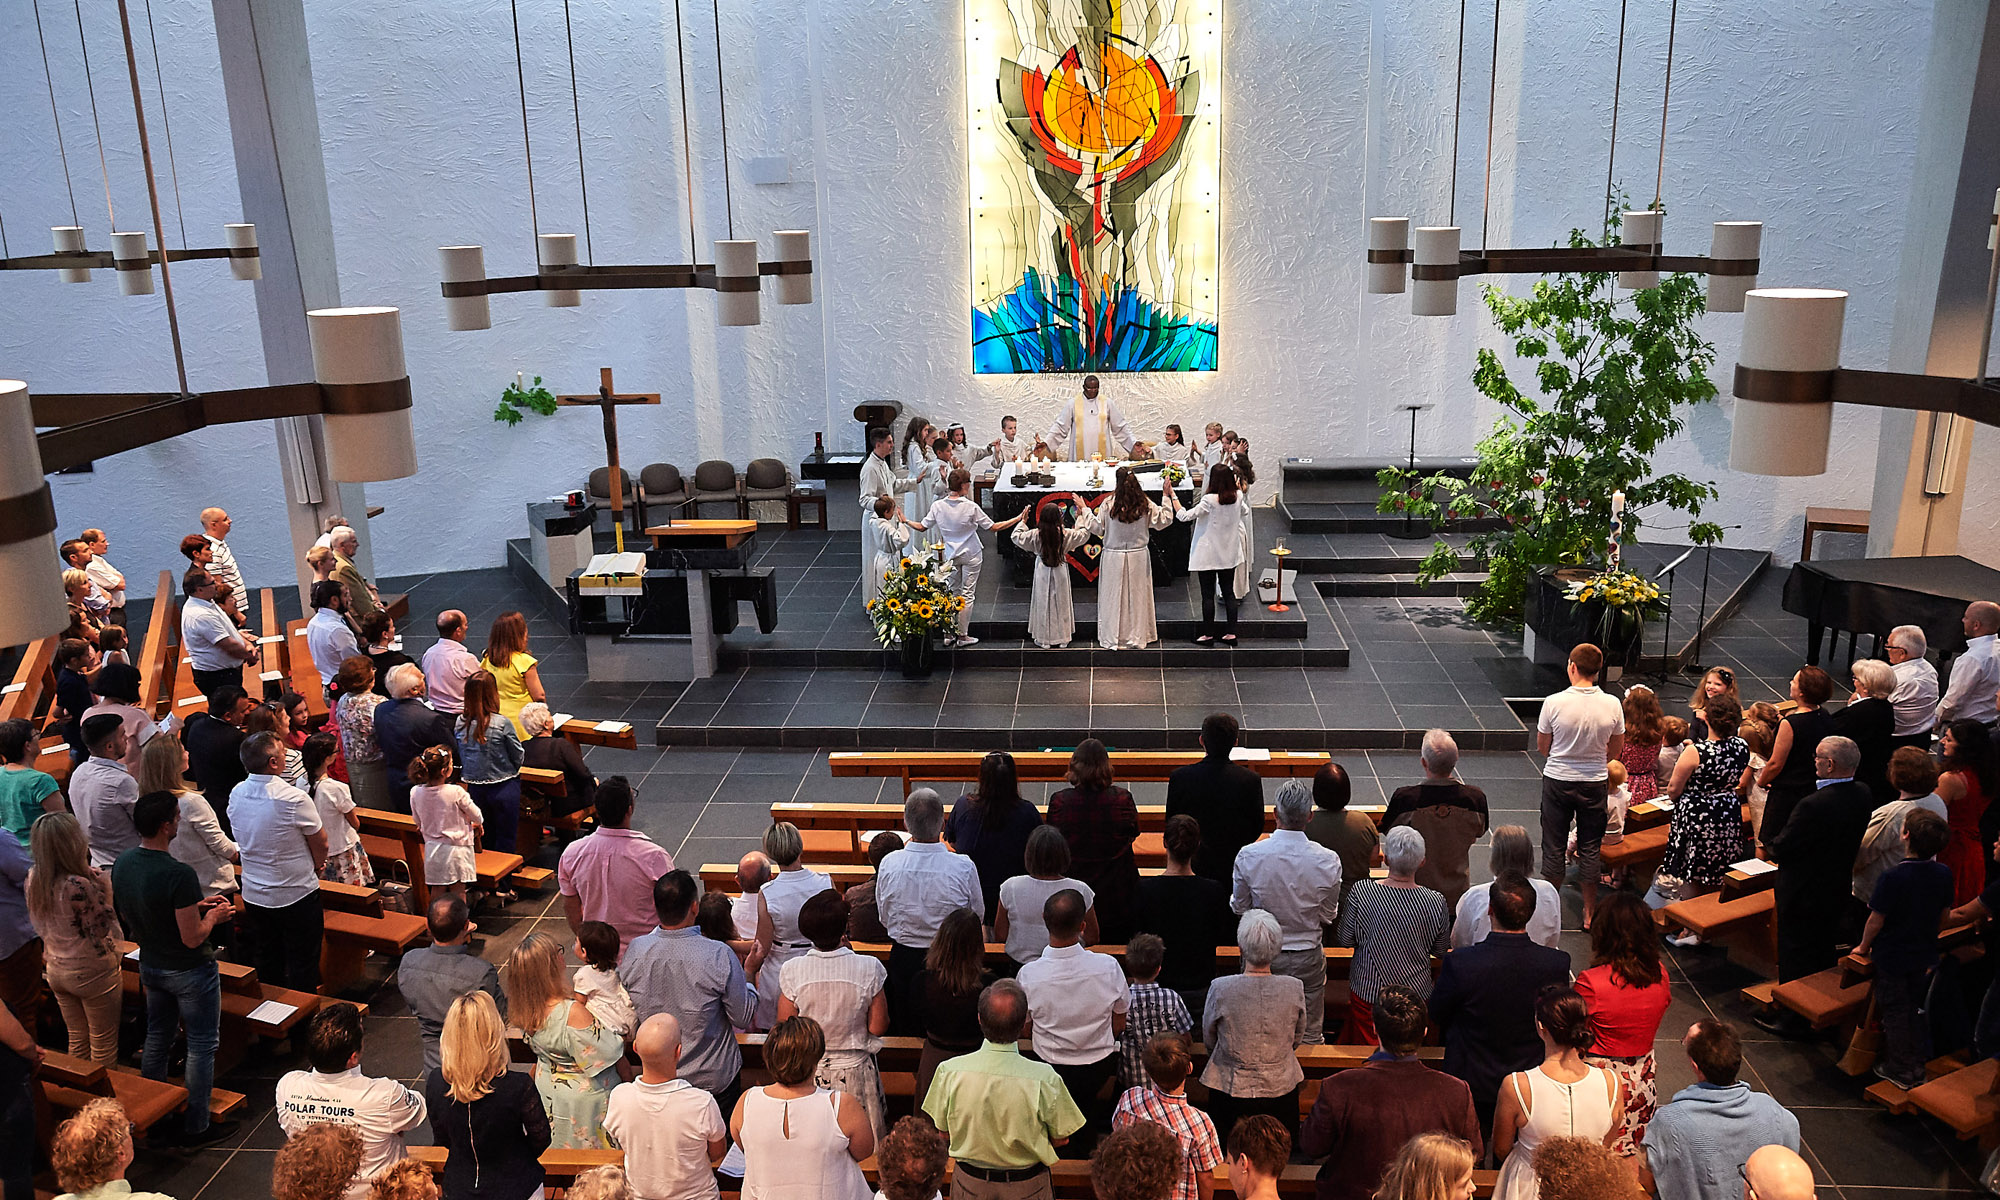 KATHOLISCHE KIRCHE ST. MAURITIUS ENGSTRINGEN